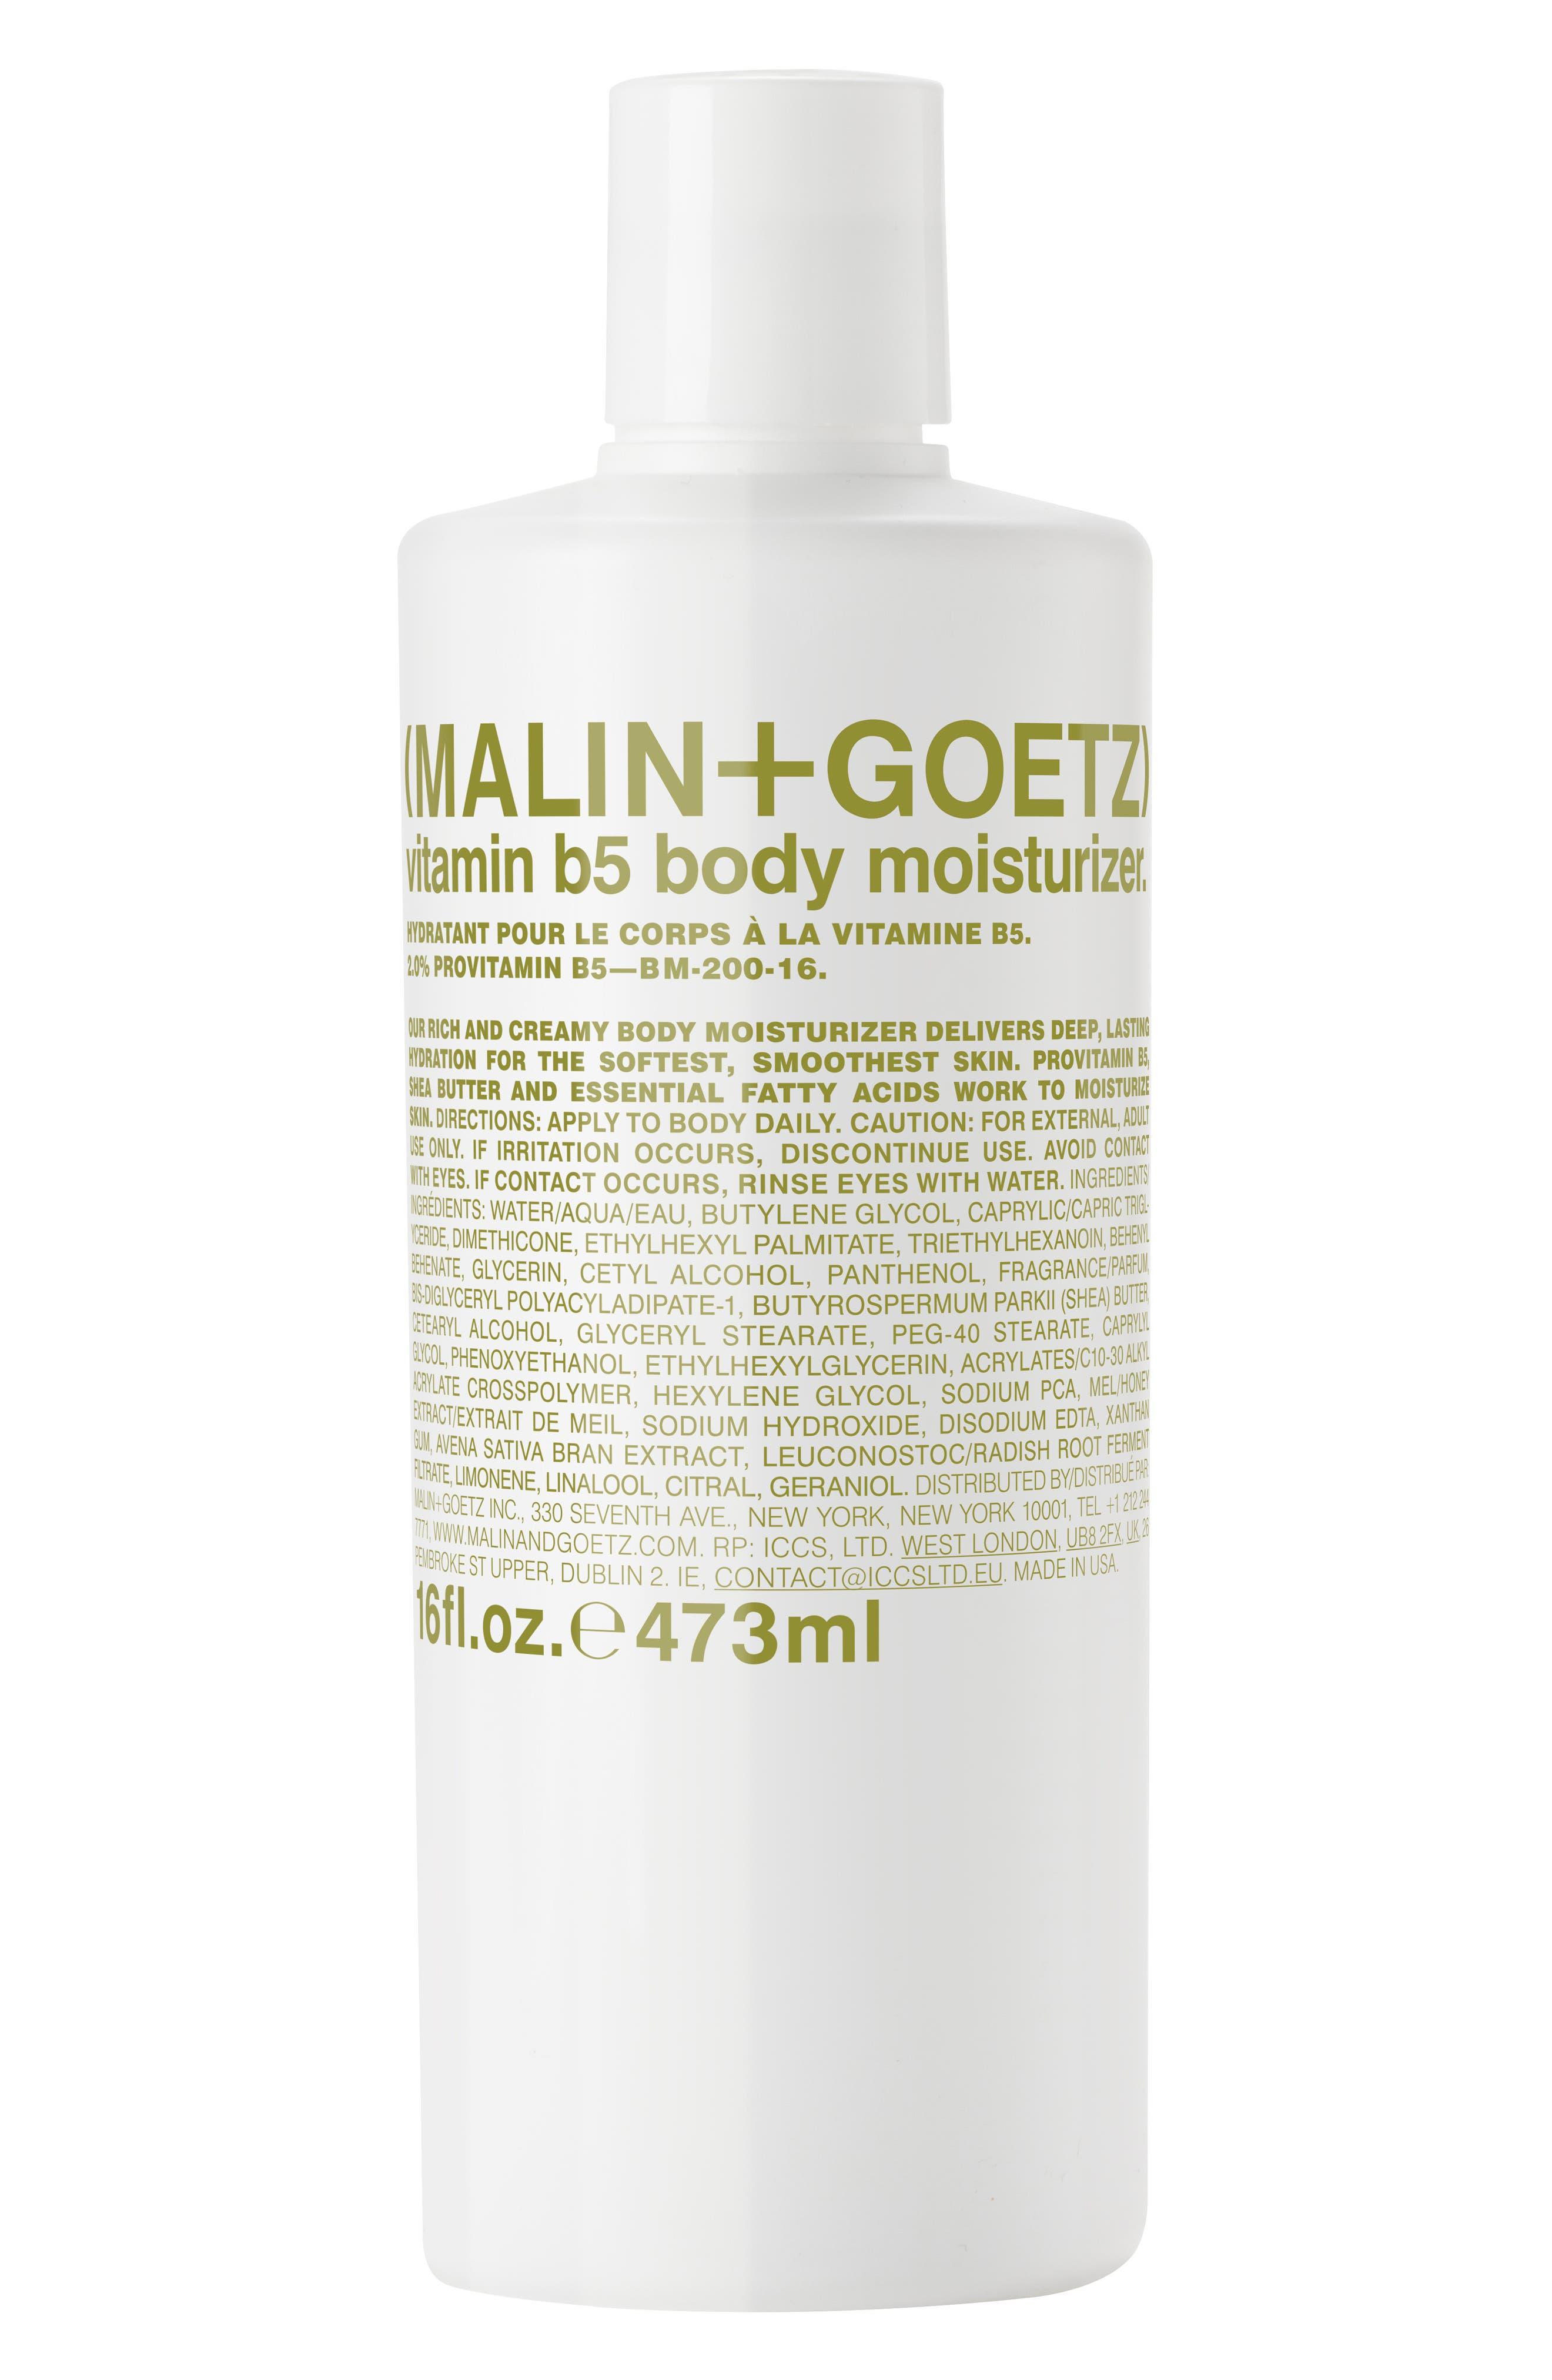 Malin+Goetz Vitamin B5 Body Moisturizer